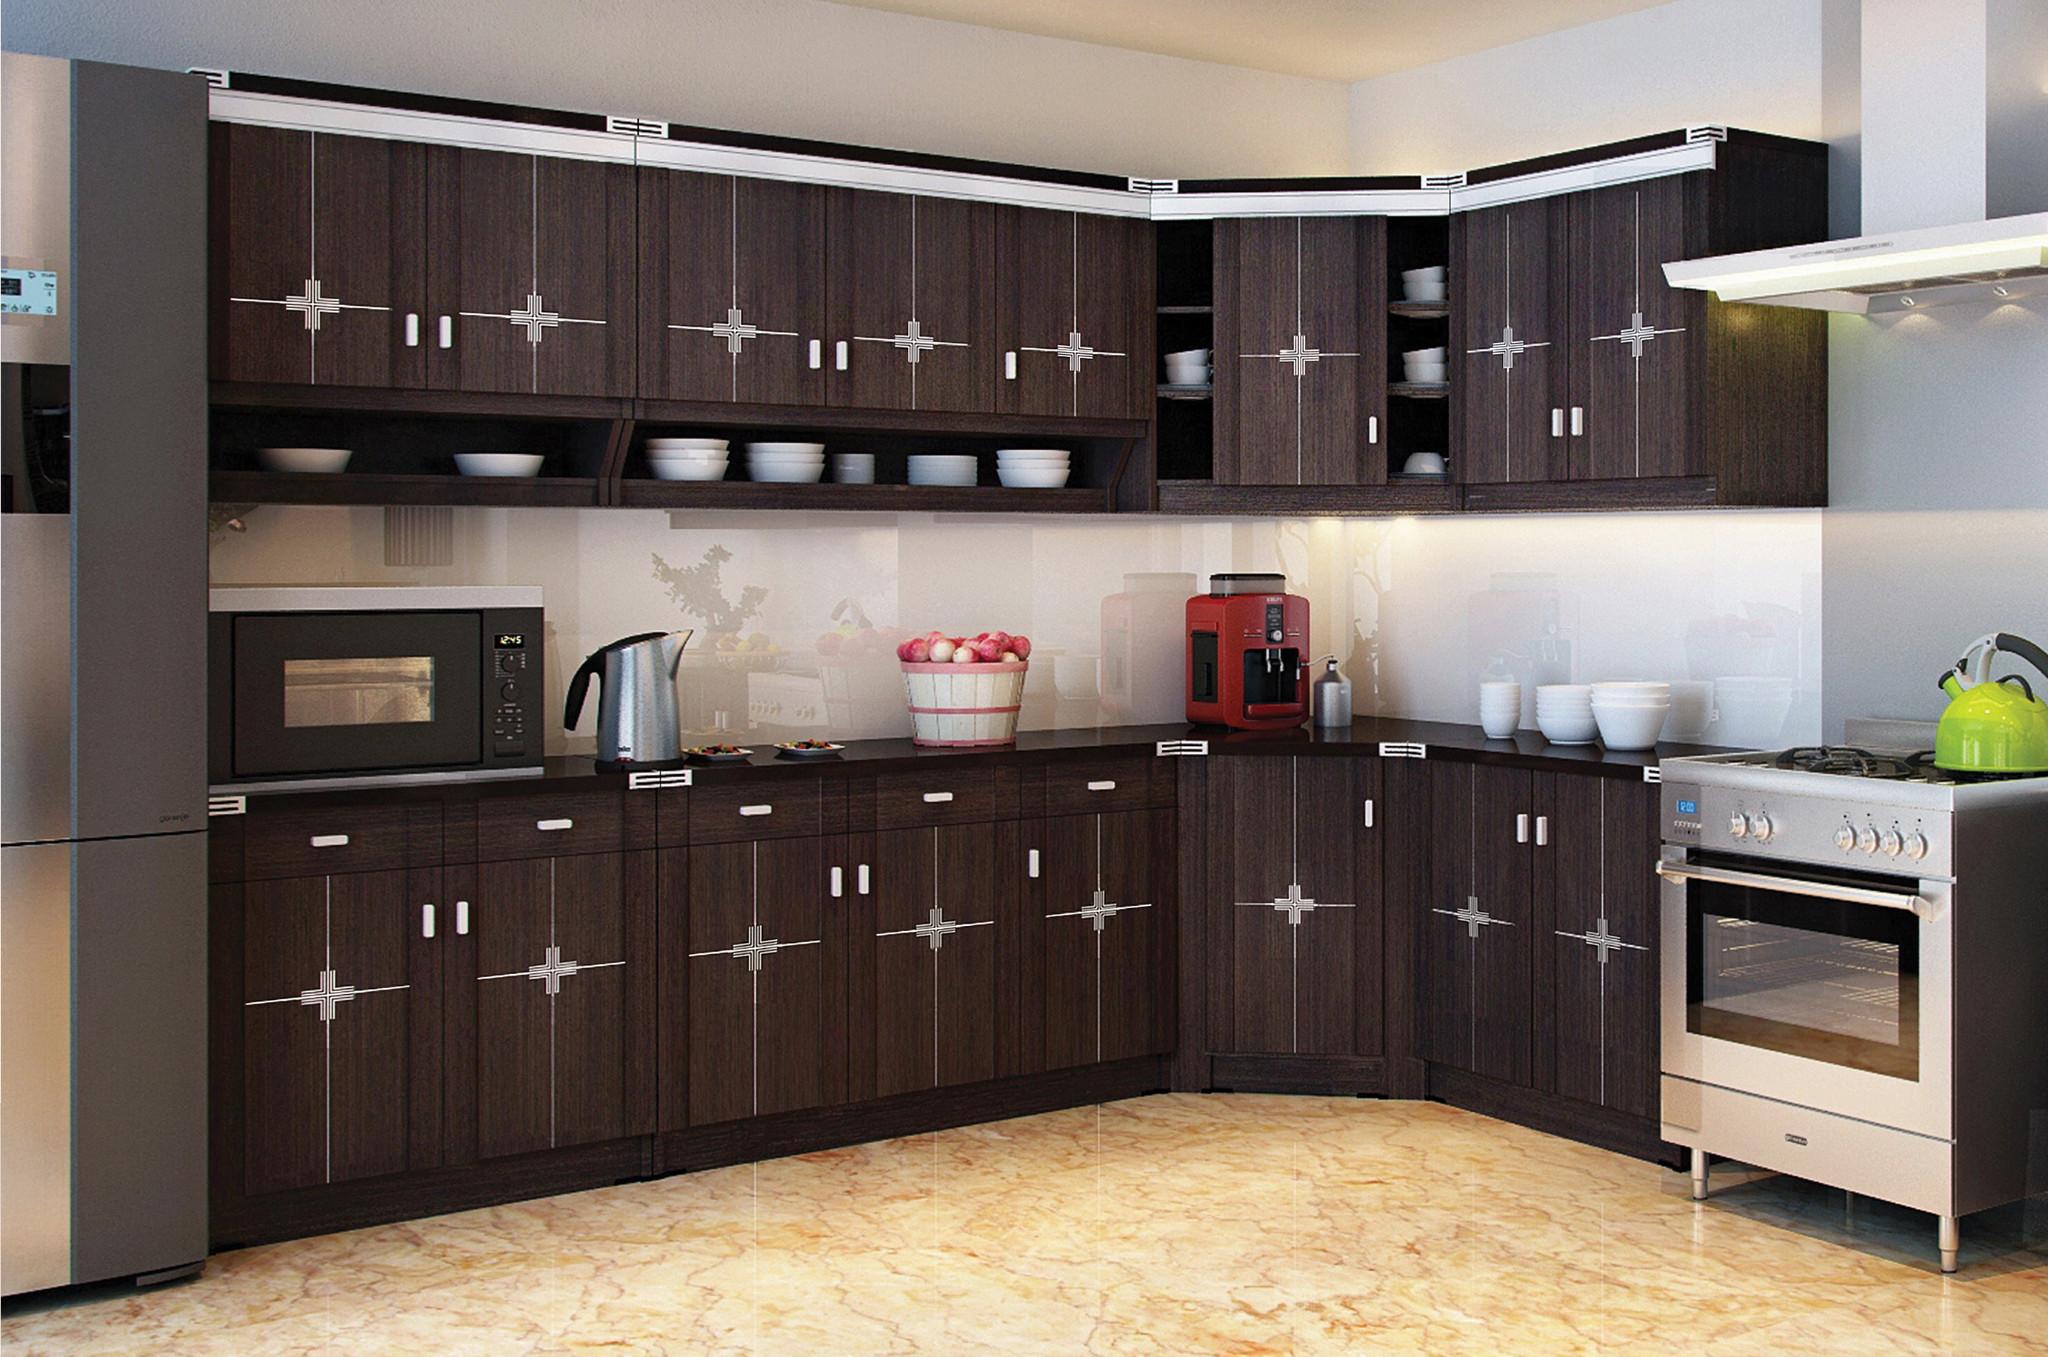 Harga kitchen set lemari dapur 3 meter di jakarta barat for Beli kitchen set jadi